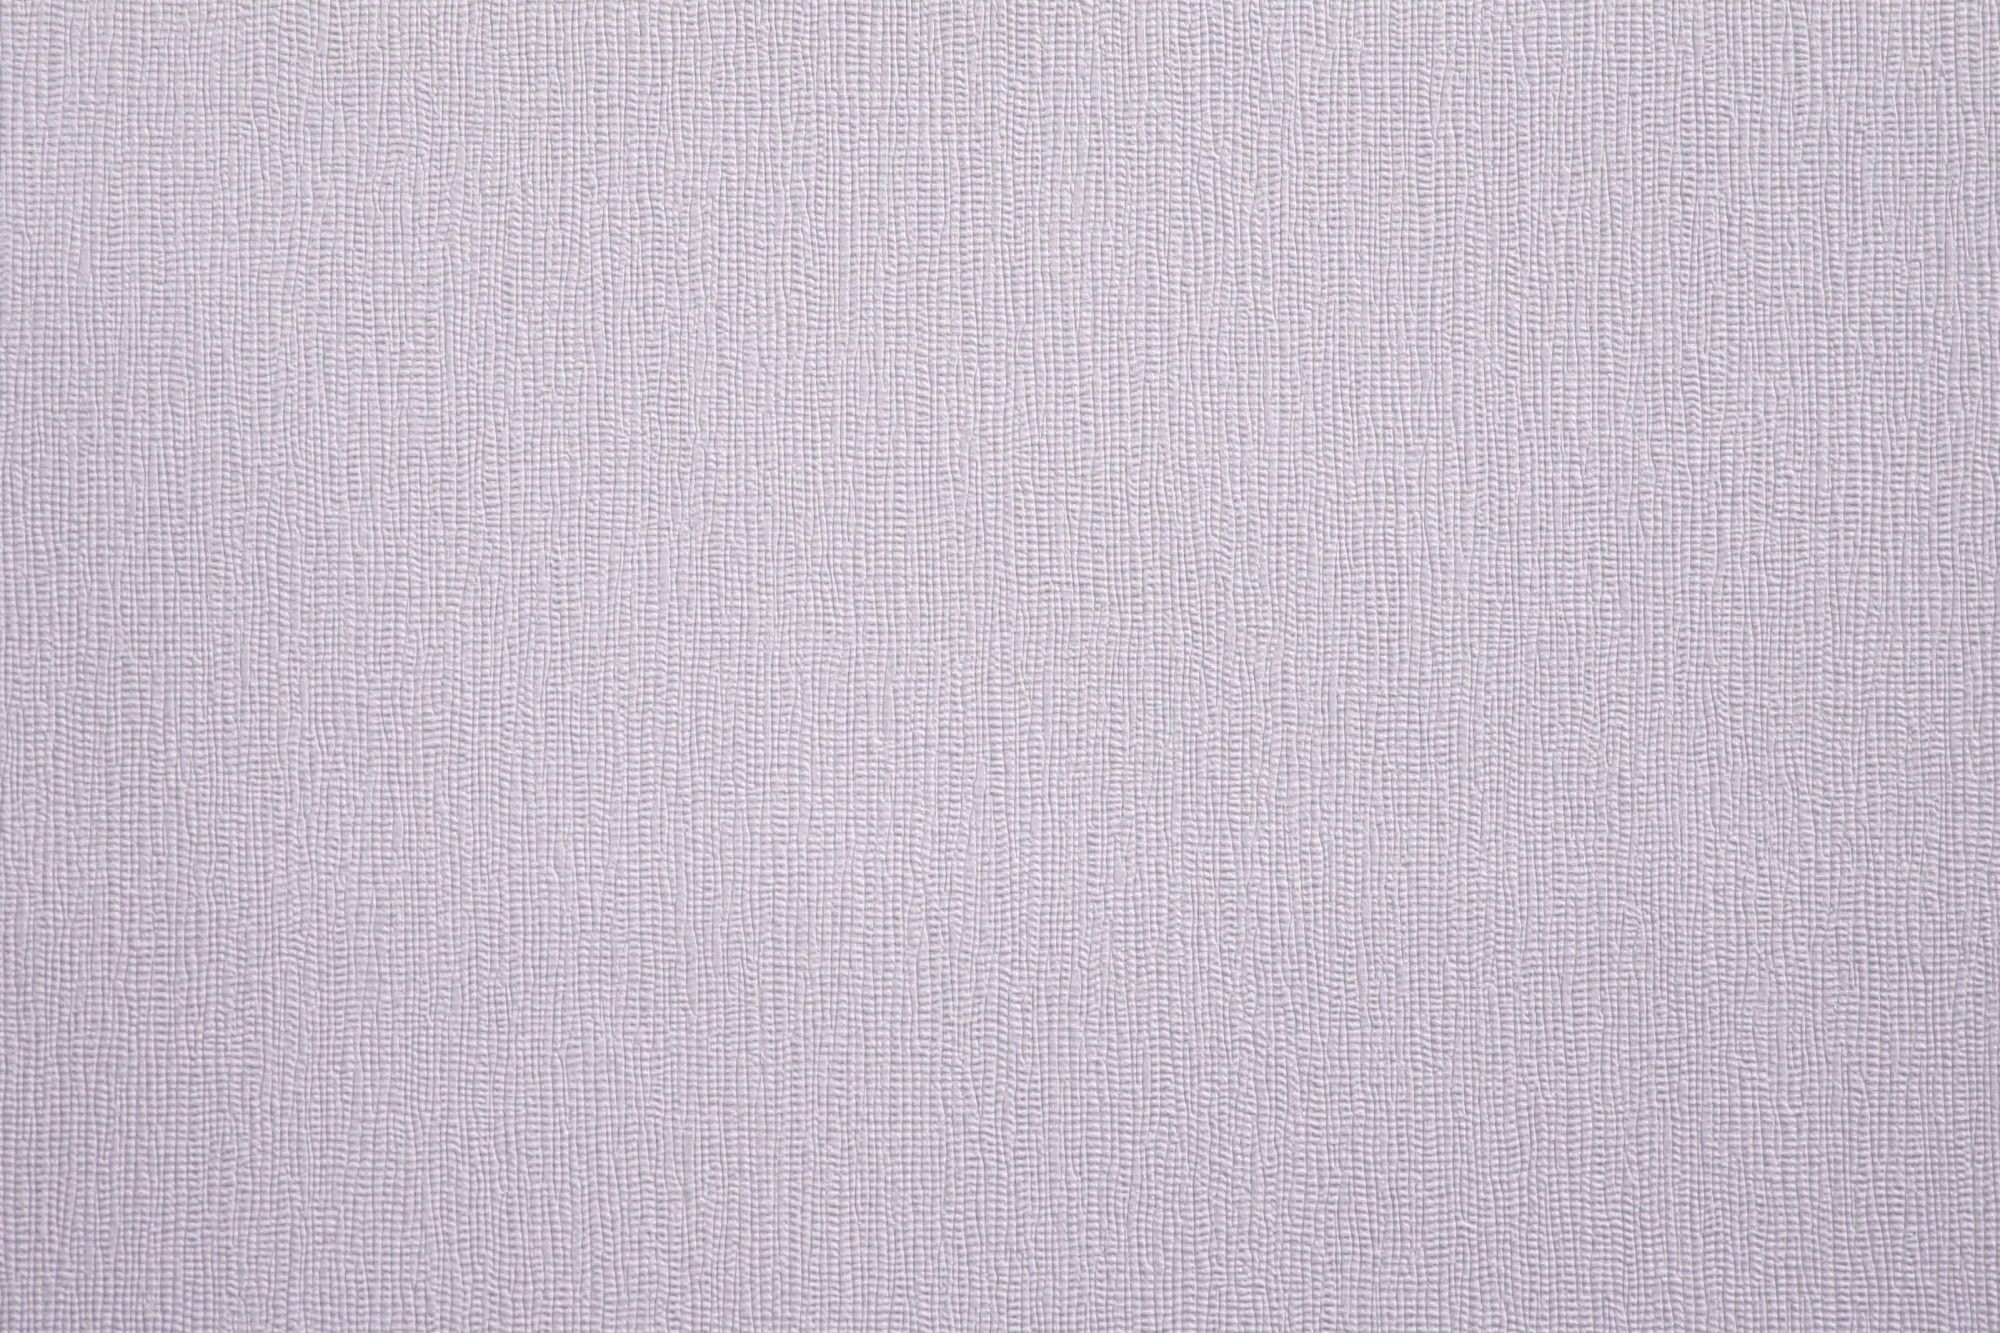 tapete rasch seduction 2014 vliestapete 796360 uni flieder ebay. Black Bedroom Furniture Sets. Home Design Ideas